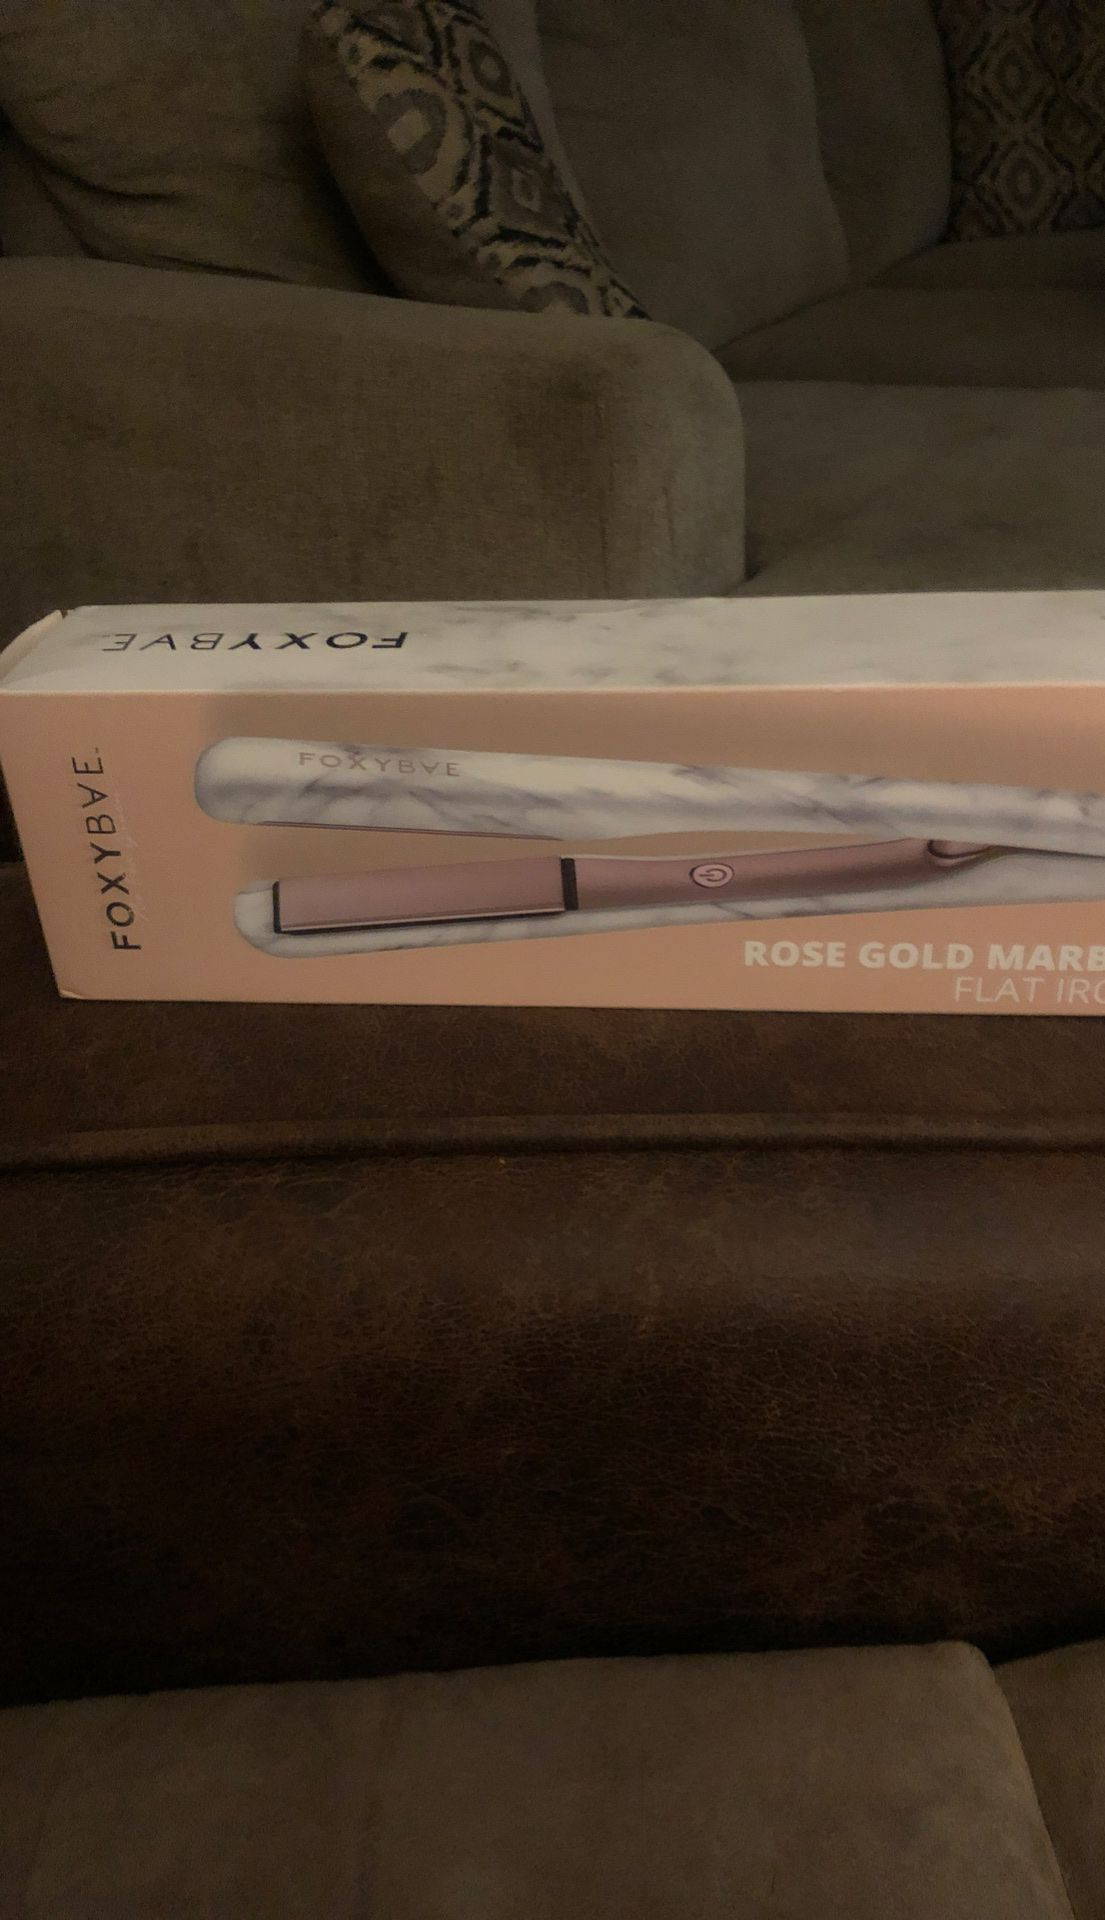 New WHITE MARBLE ROSE GOLD FLAT IRON